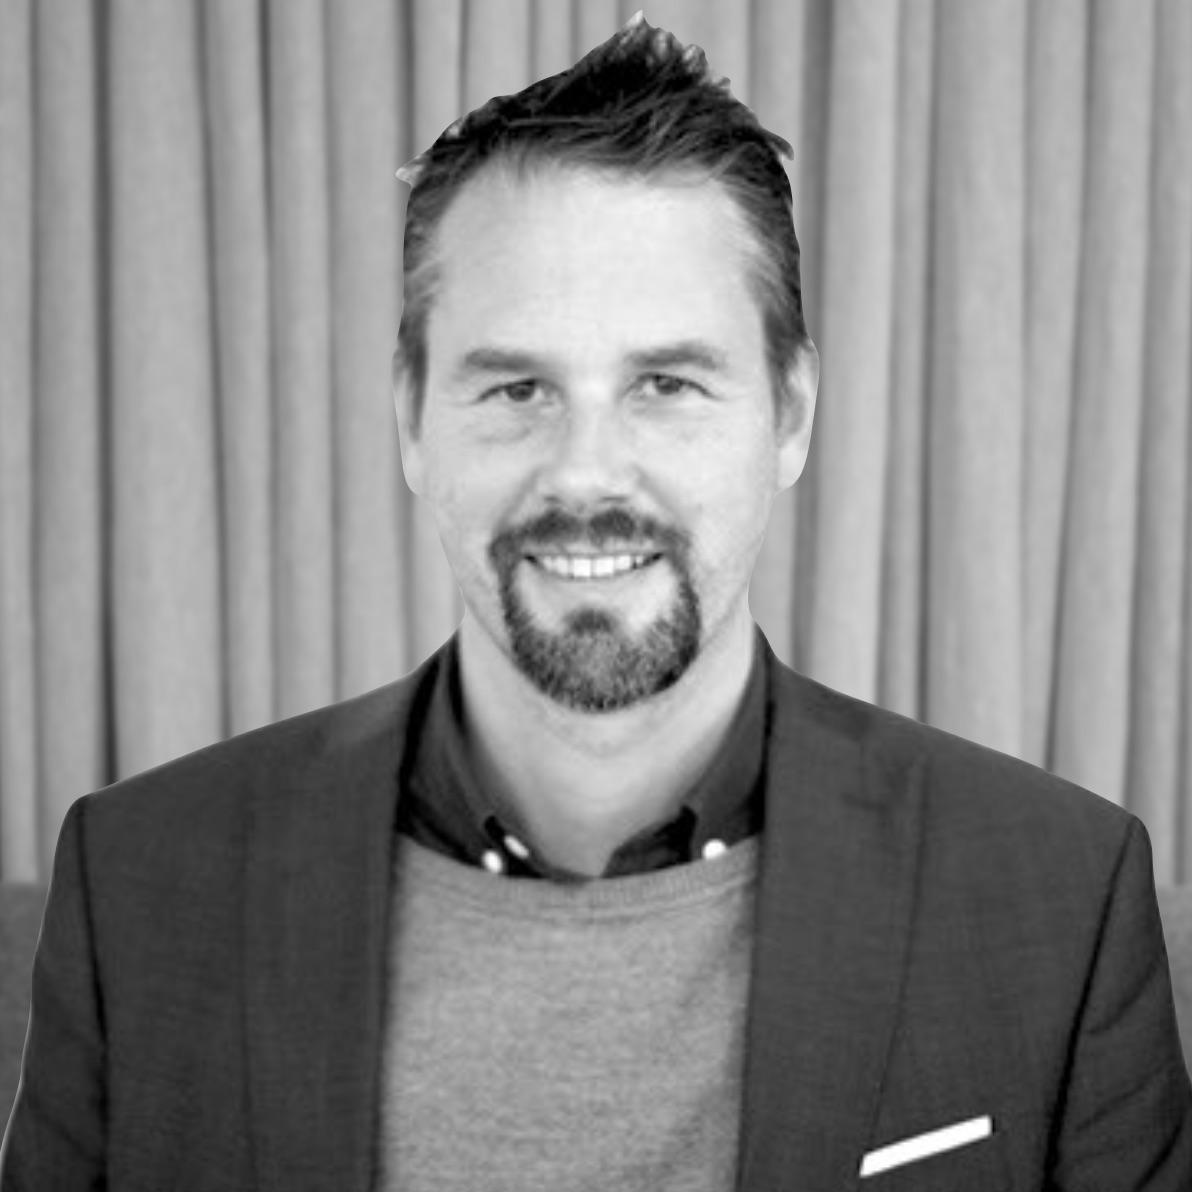 Mikael Ahlström